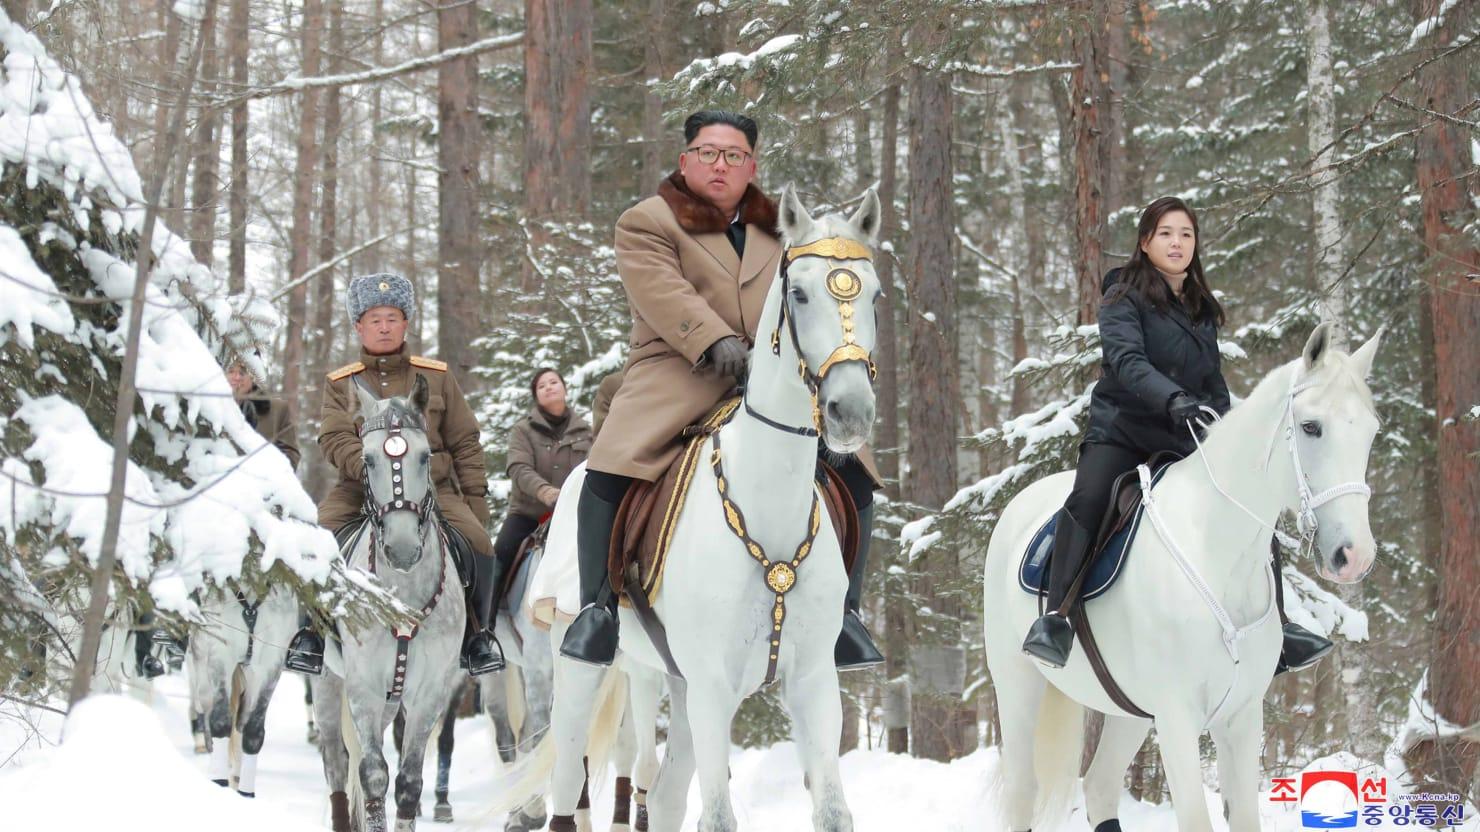 Kim Jong Un's Ugly Christmas Surprise: A Return to Threats of War